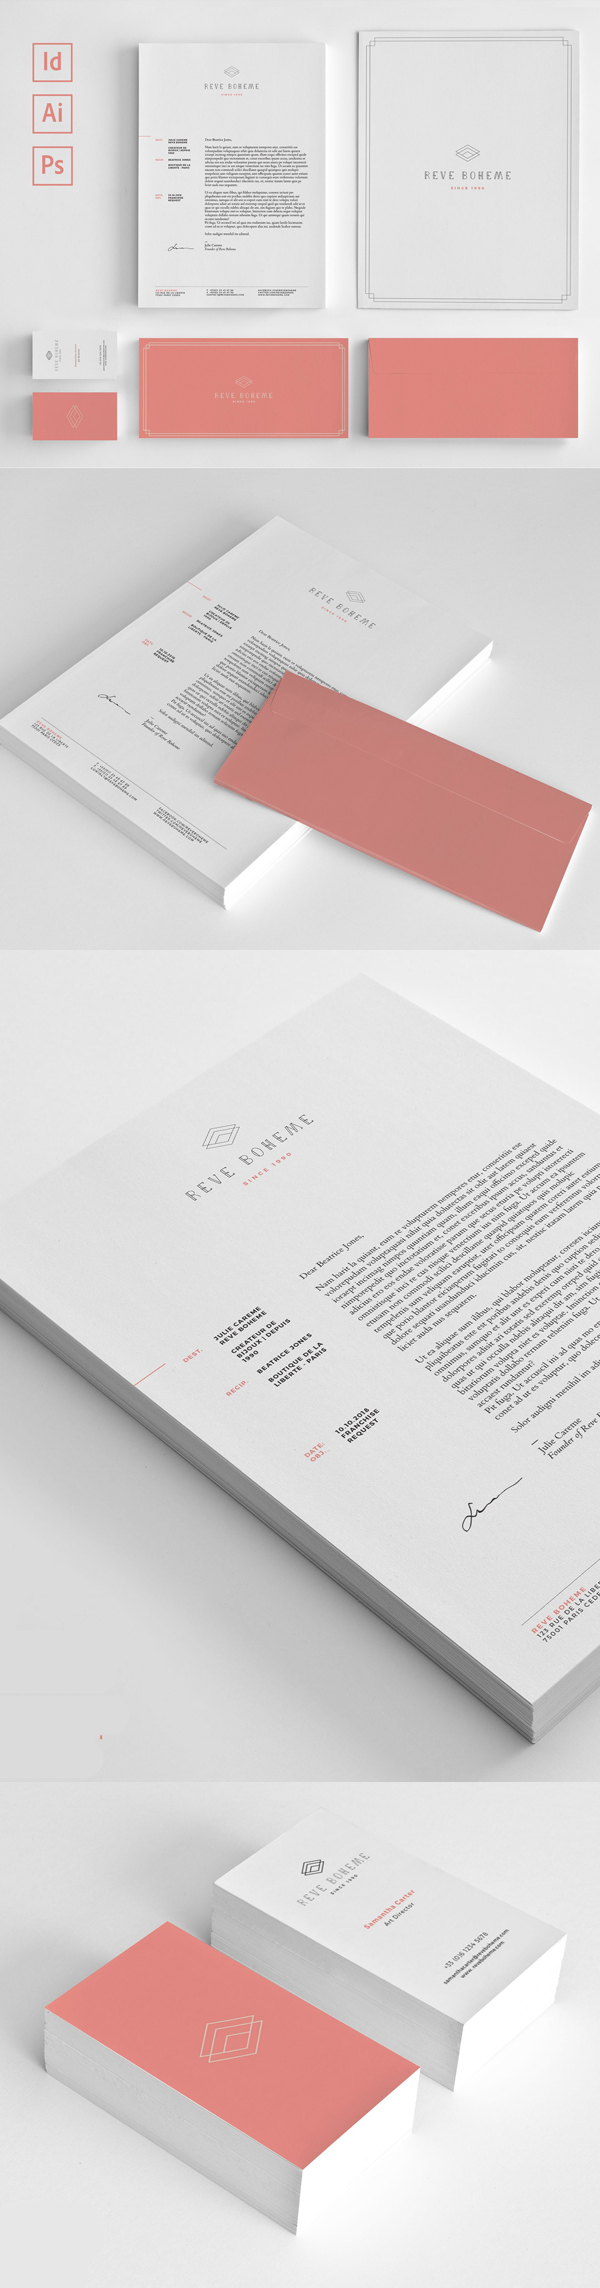 Modern Business Branding / Stationery Templates Design - 4